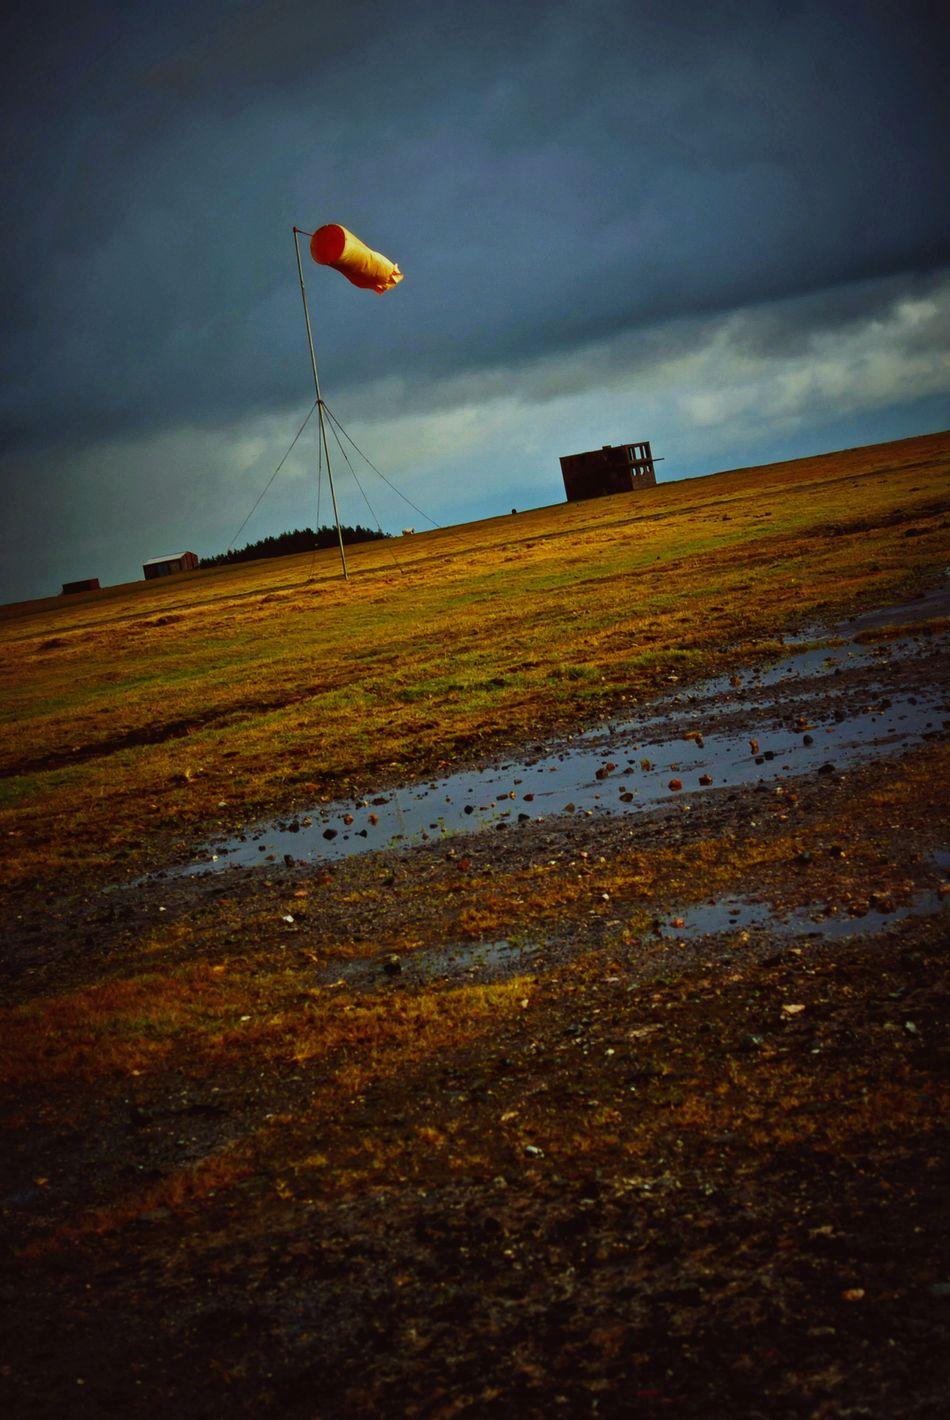 DISUSED Airfield Davidstow Cornwall Stormysky Puddles Rainy Days